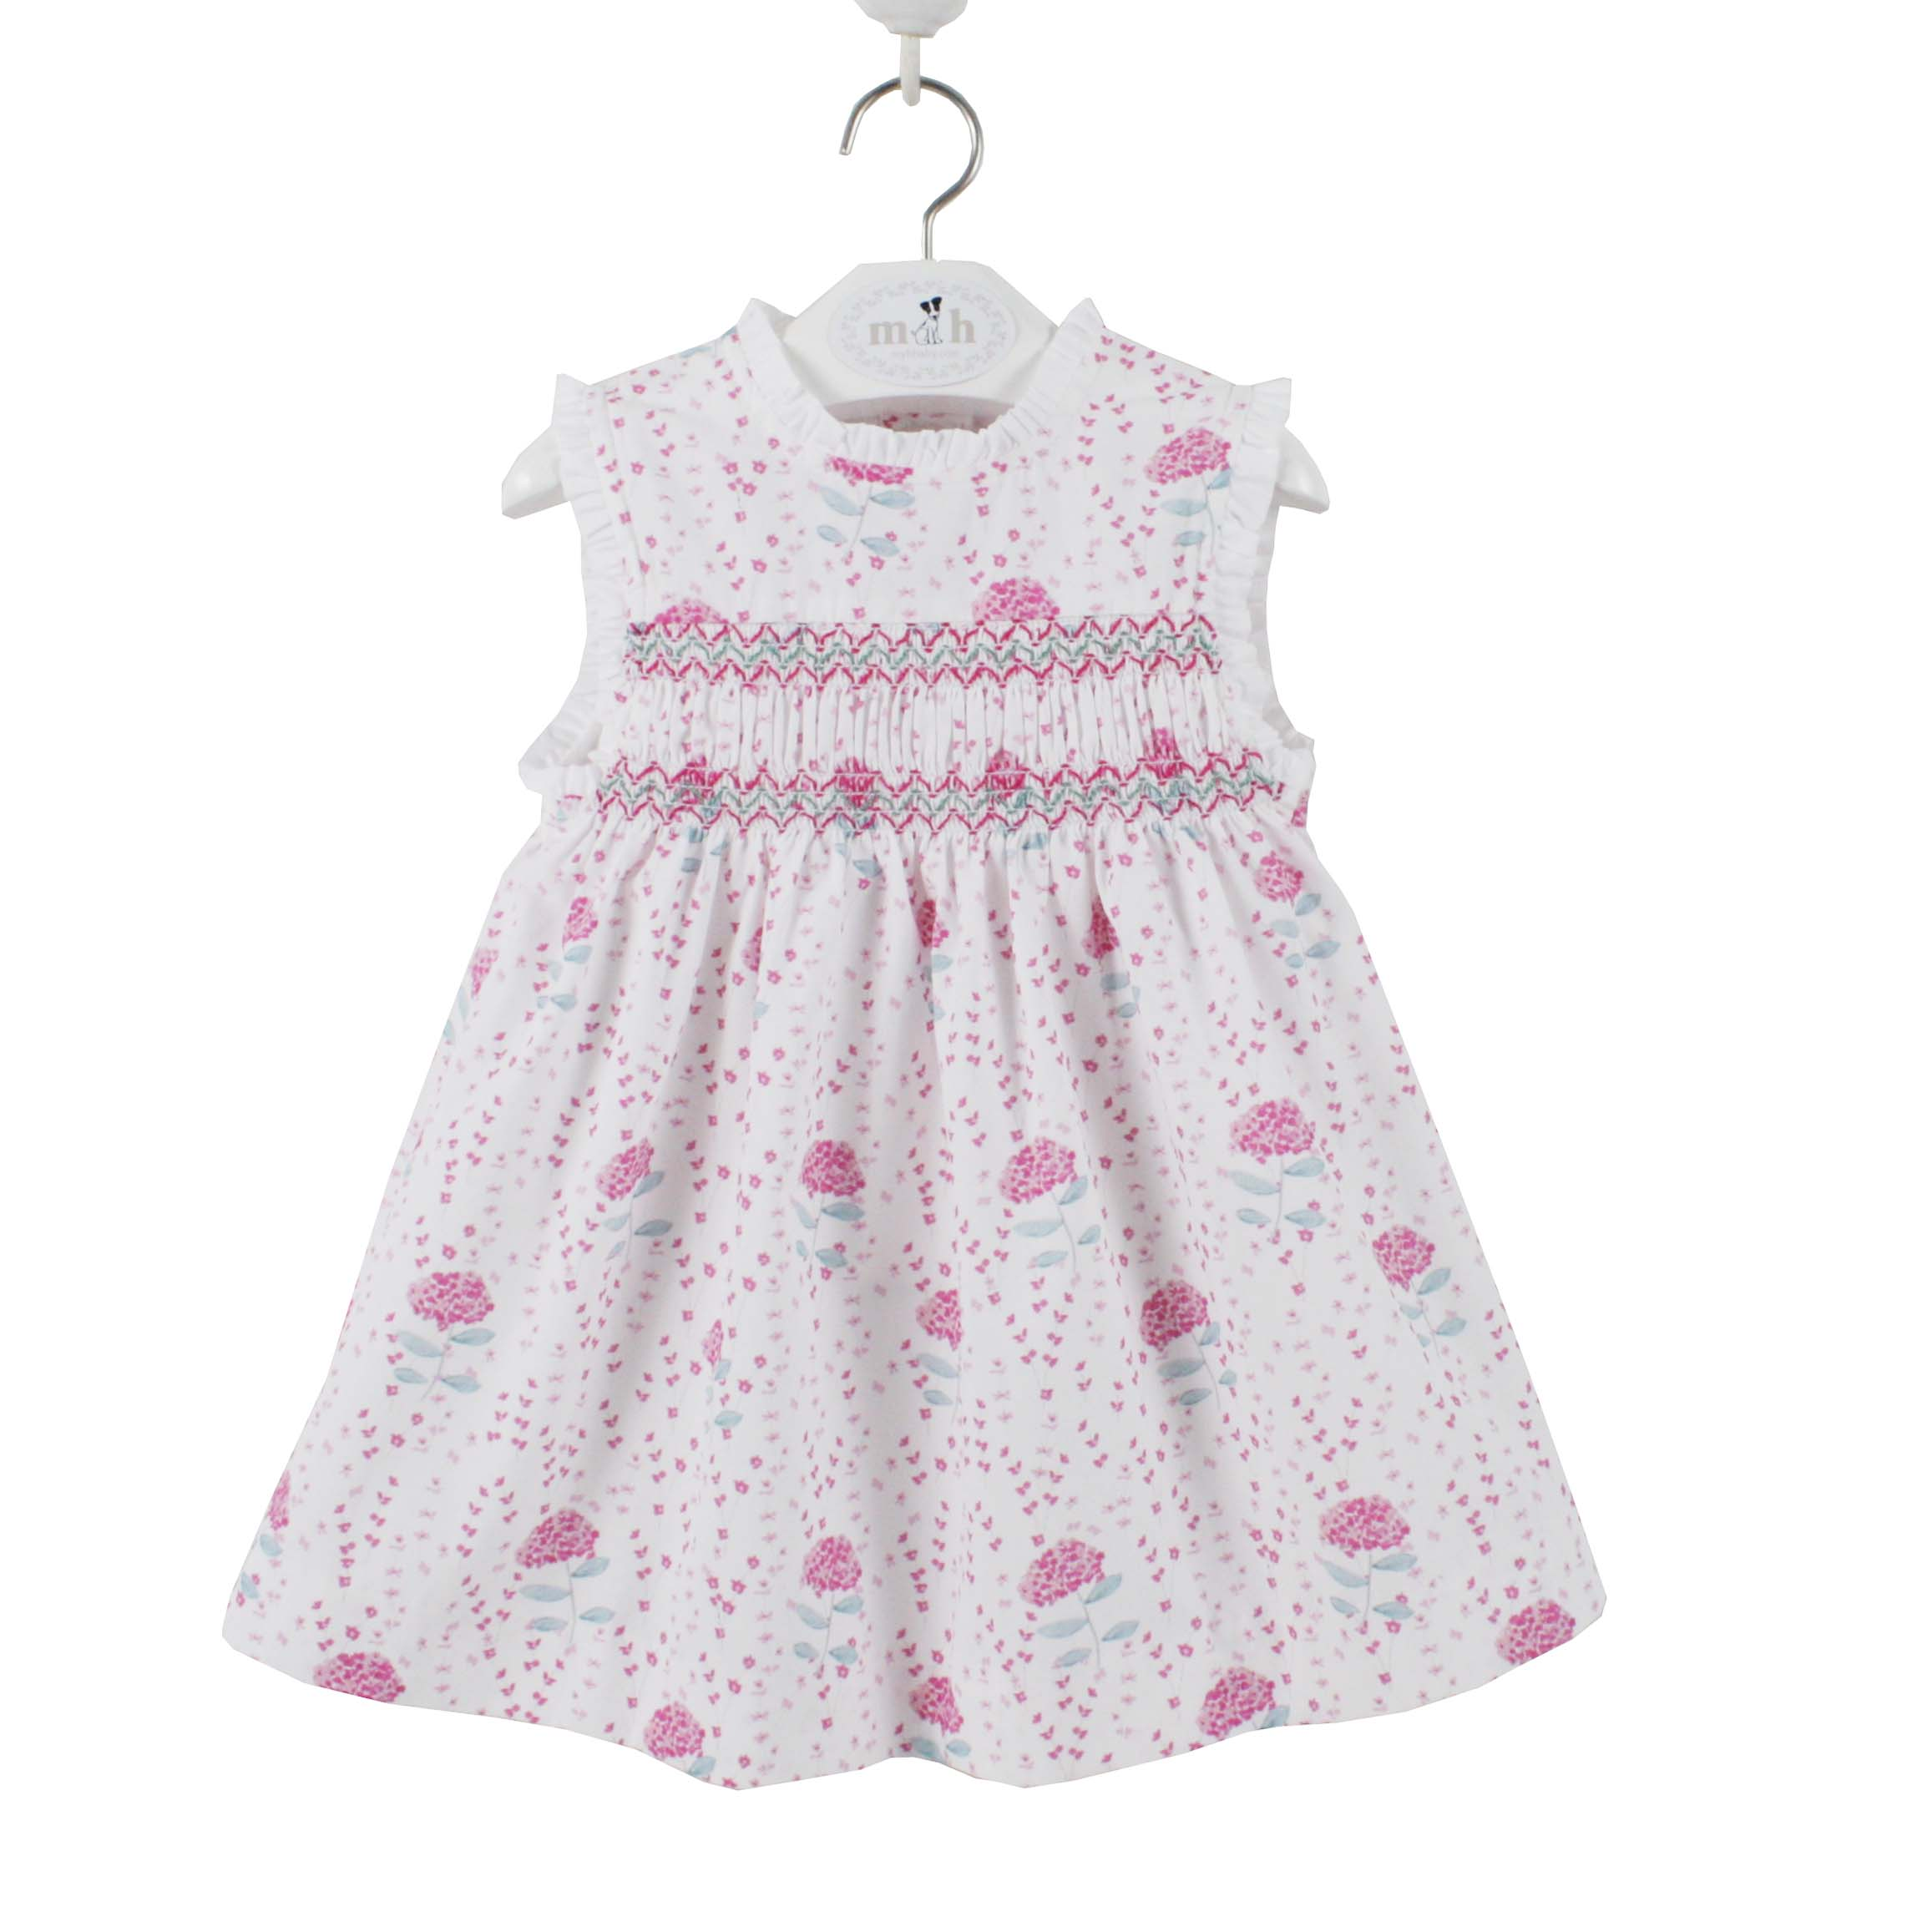 Girls Pink Short Dungarees 6-9months. Girls' Clothing (0-24 Months)